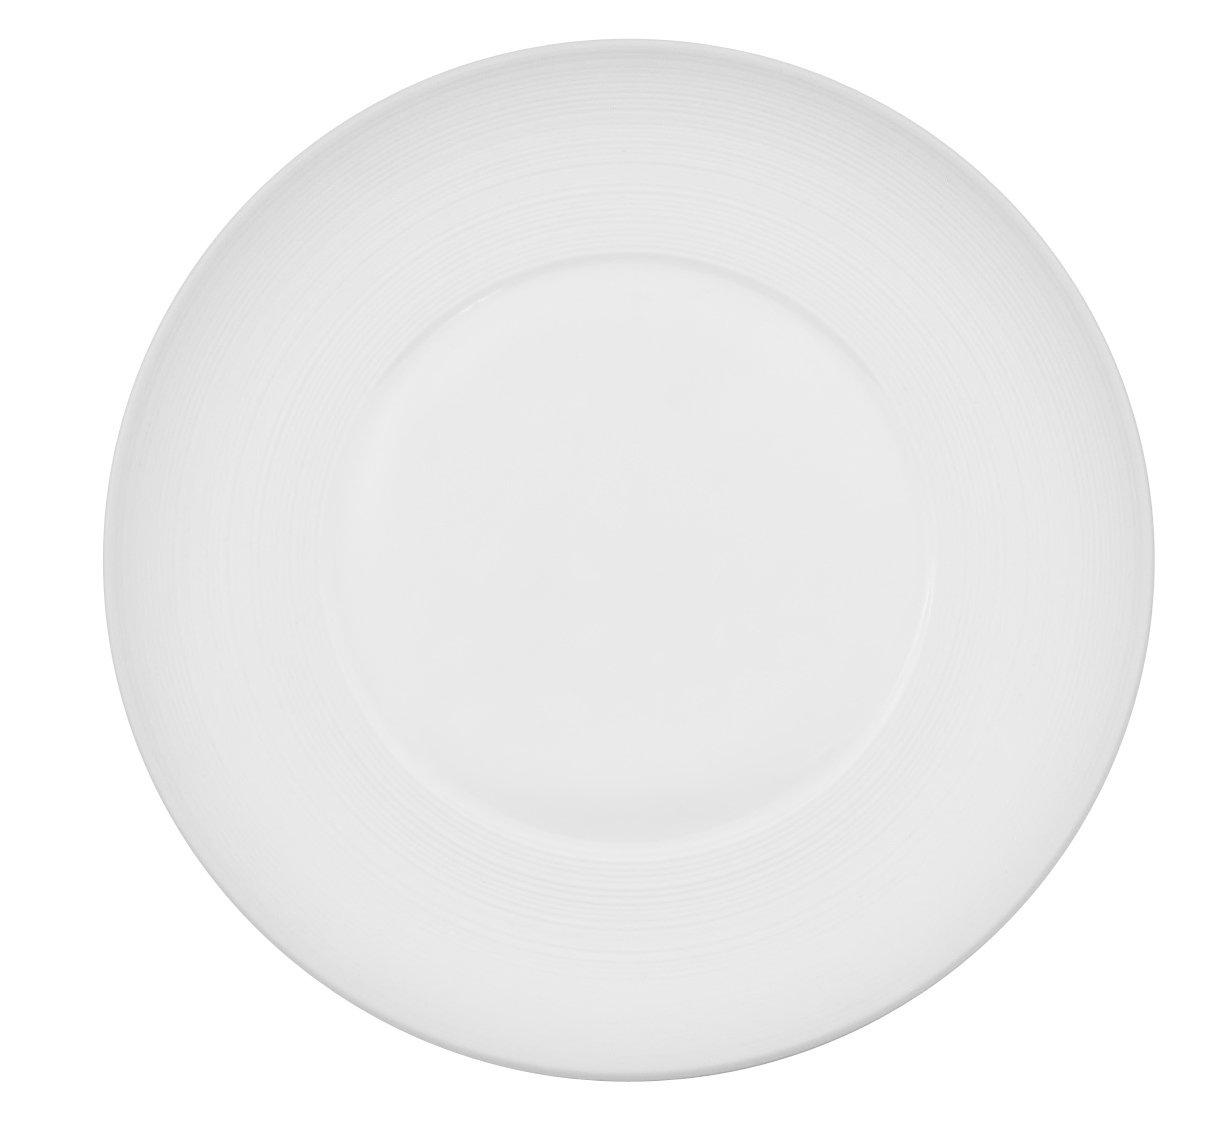 CAC China TST-W6 Transitions 6-1/4-Inch Non-Glare Glaze Super White Porcelain Wide Rim Plate, Box of 36